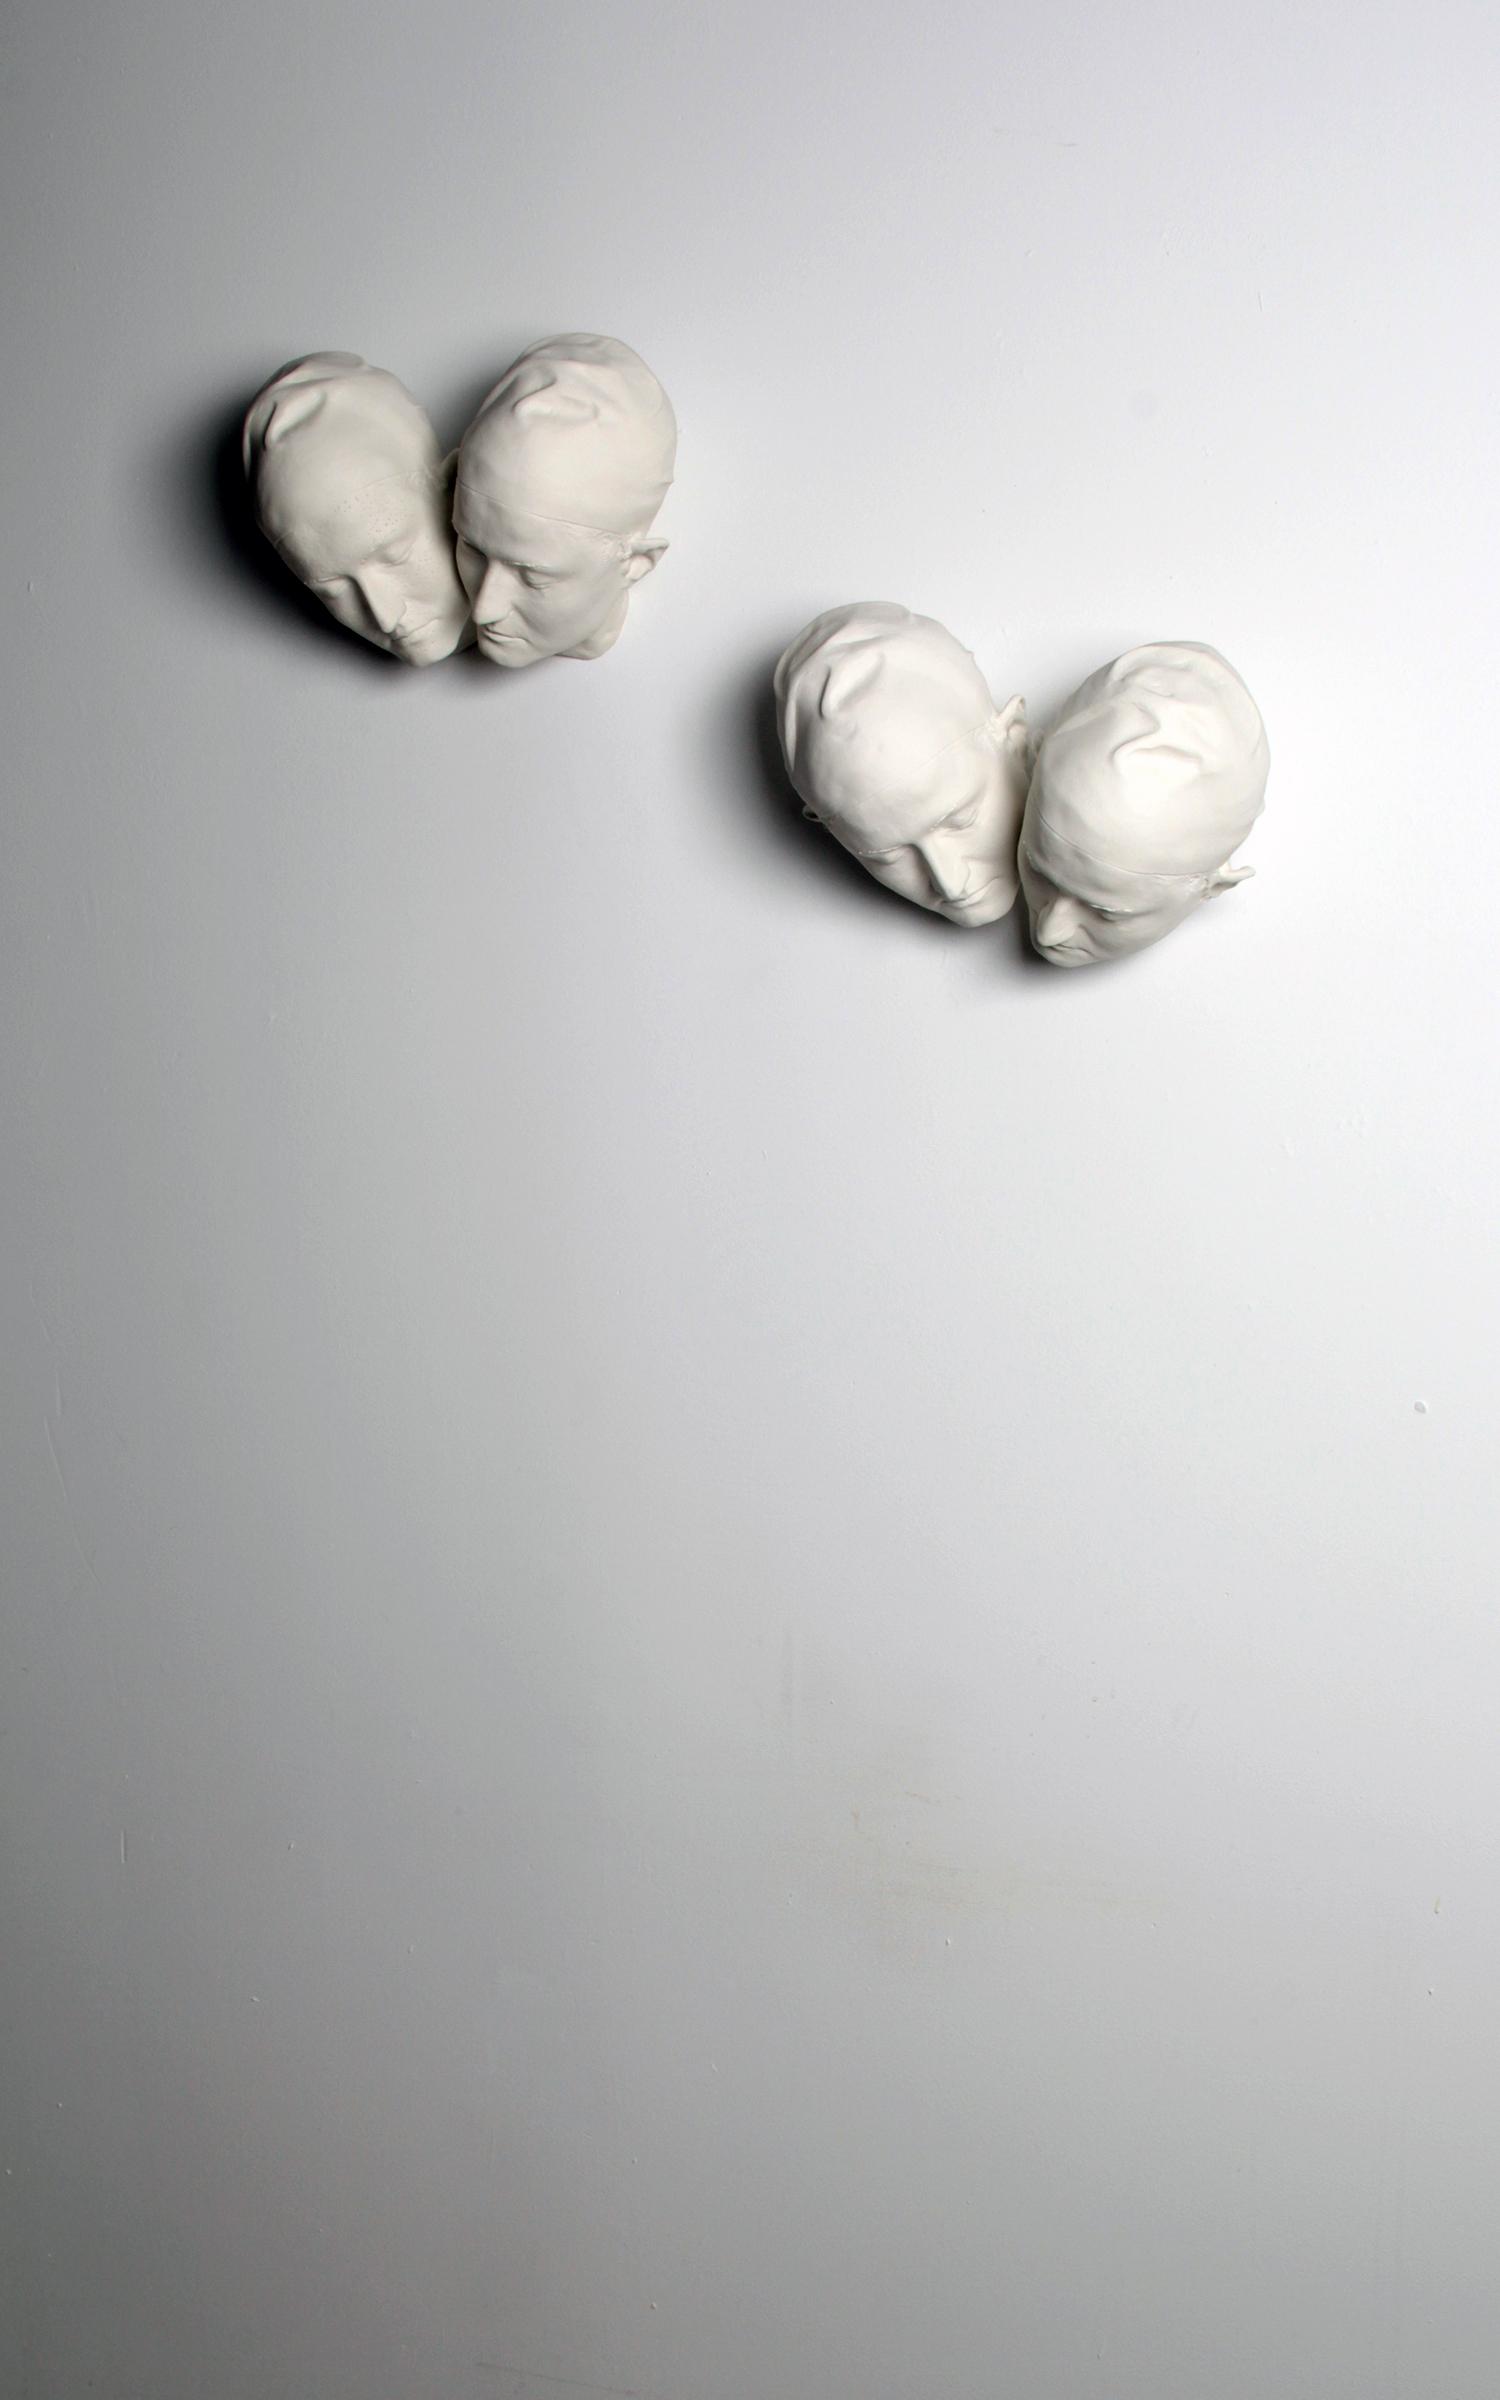 4 Heads on Wall copy.jpg